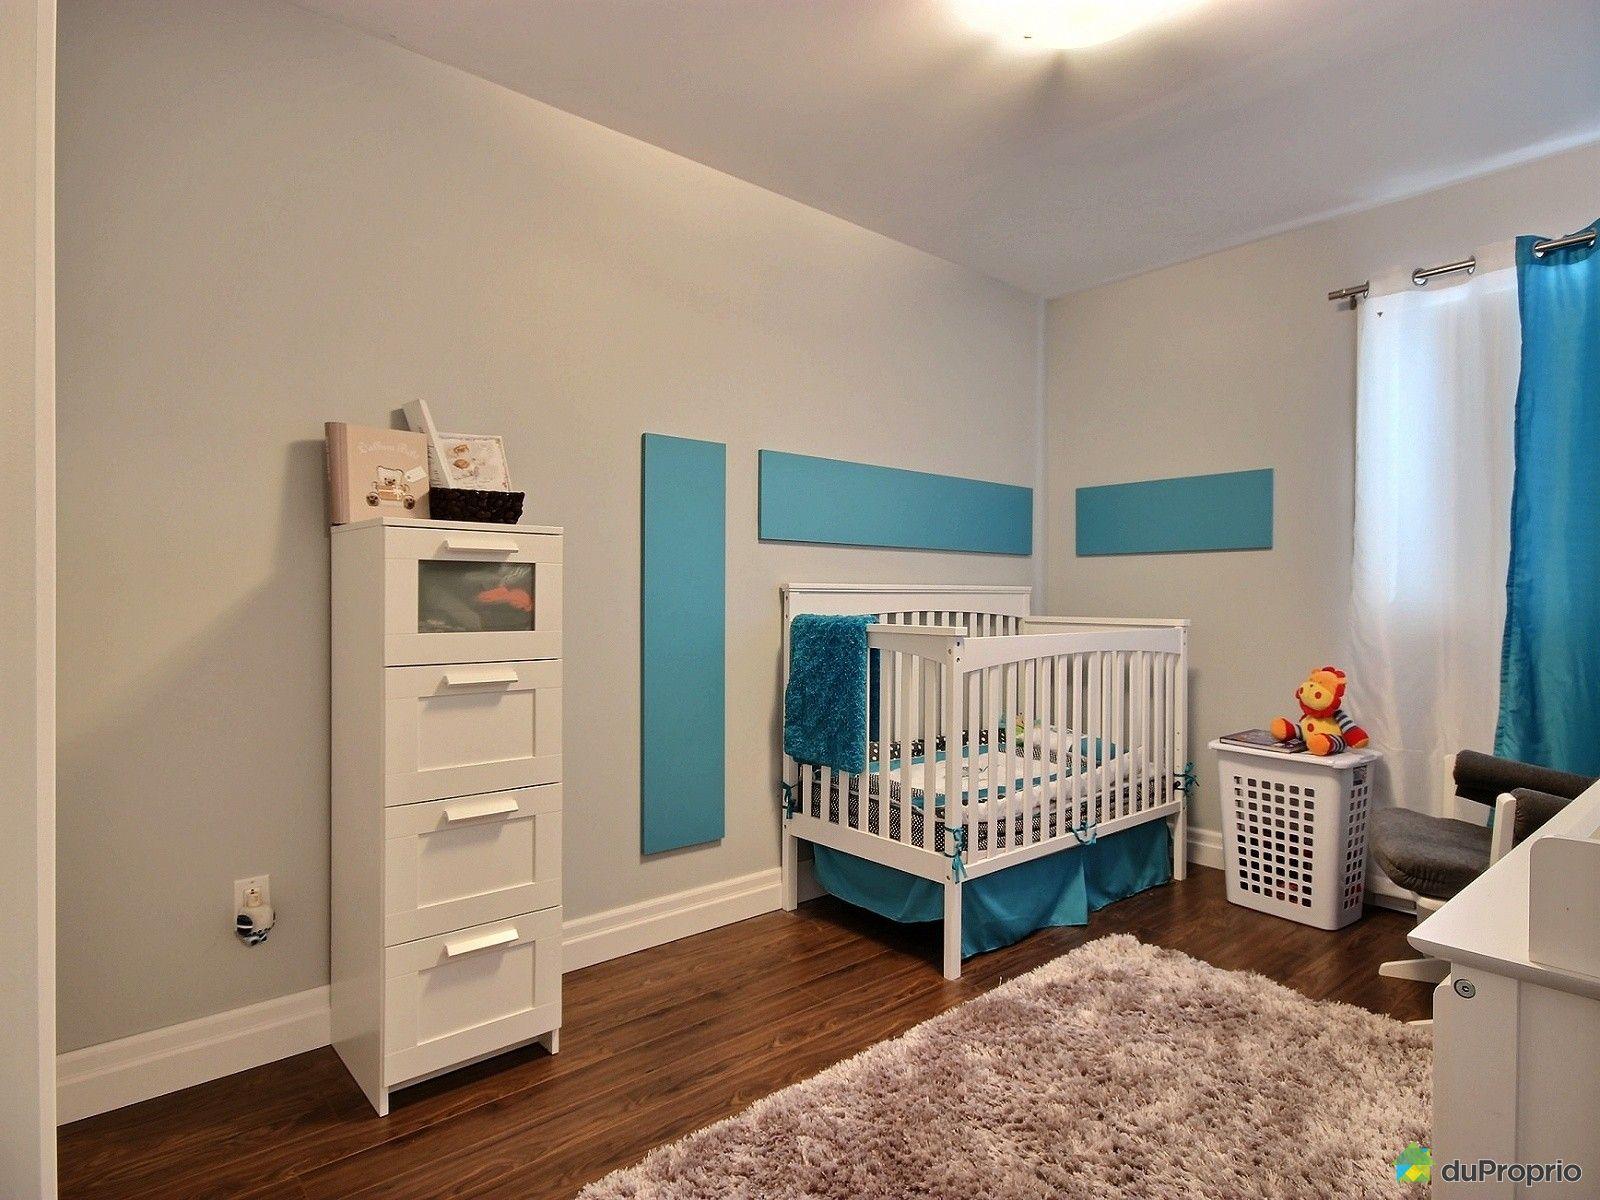 maison vendu victoriaville immobilier qu bec duproprio 397891. Black Bedroom Furniture Sets. Home Design Ideas